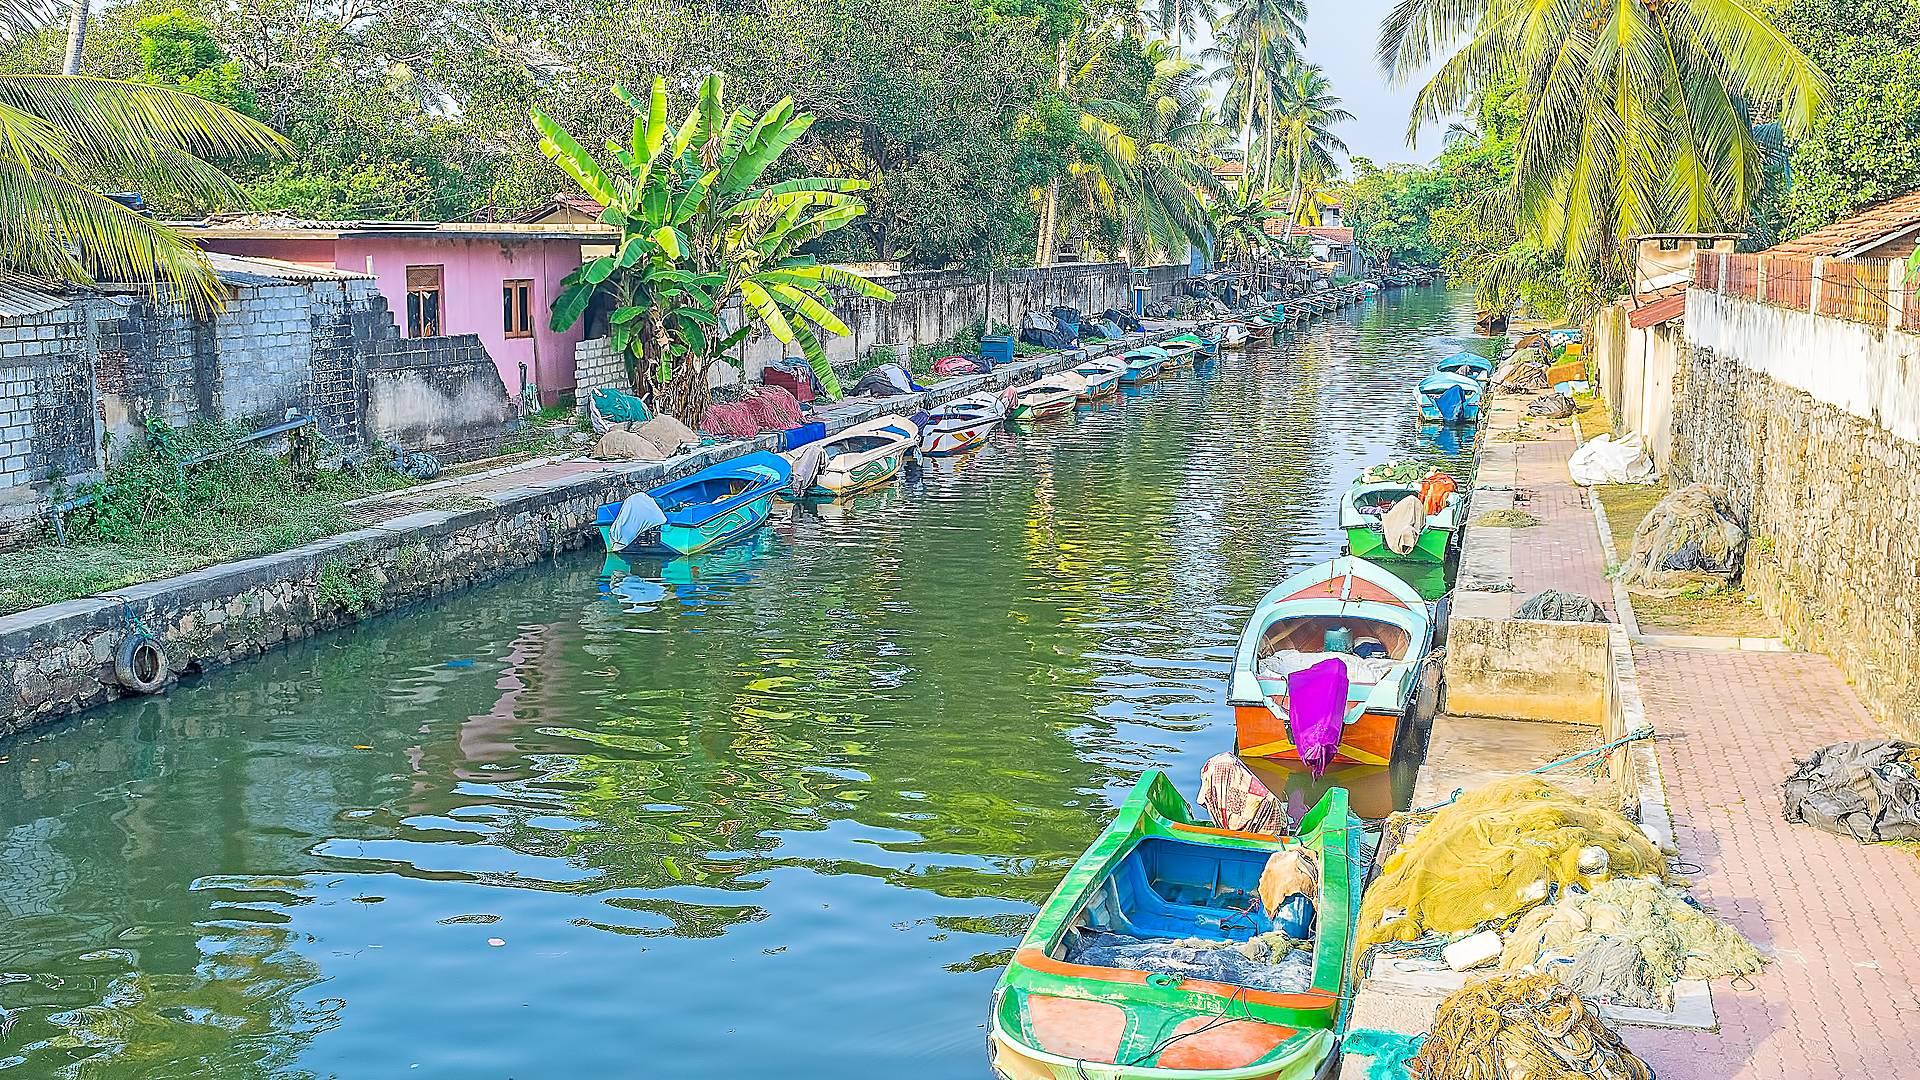 Los ineludibles de Sri Lanka